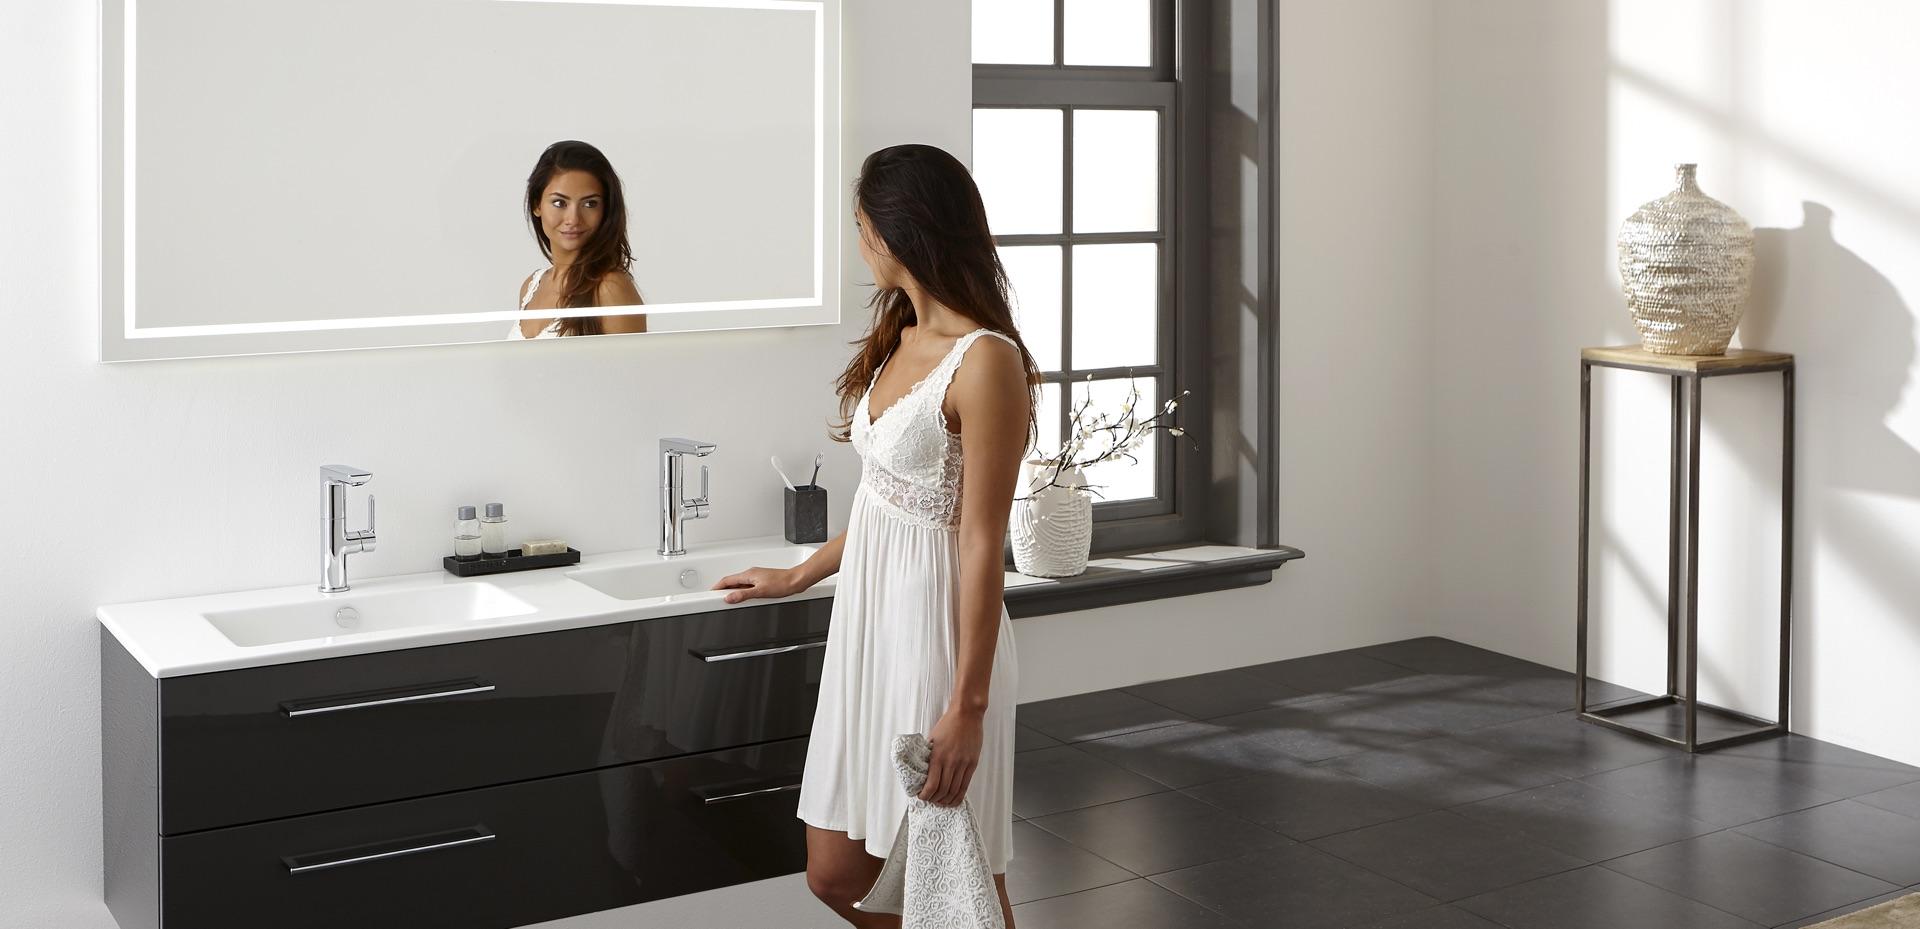 mijn-bad-in-stijl-badkamer-model-spiegel-wit-zwart